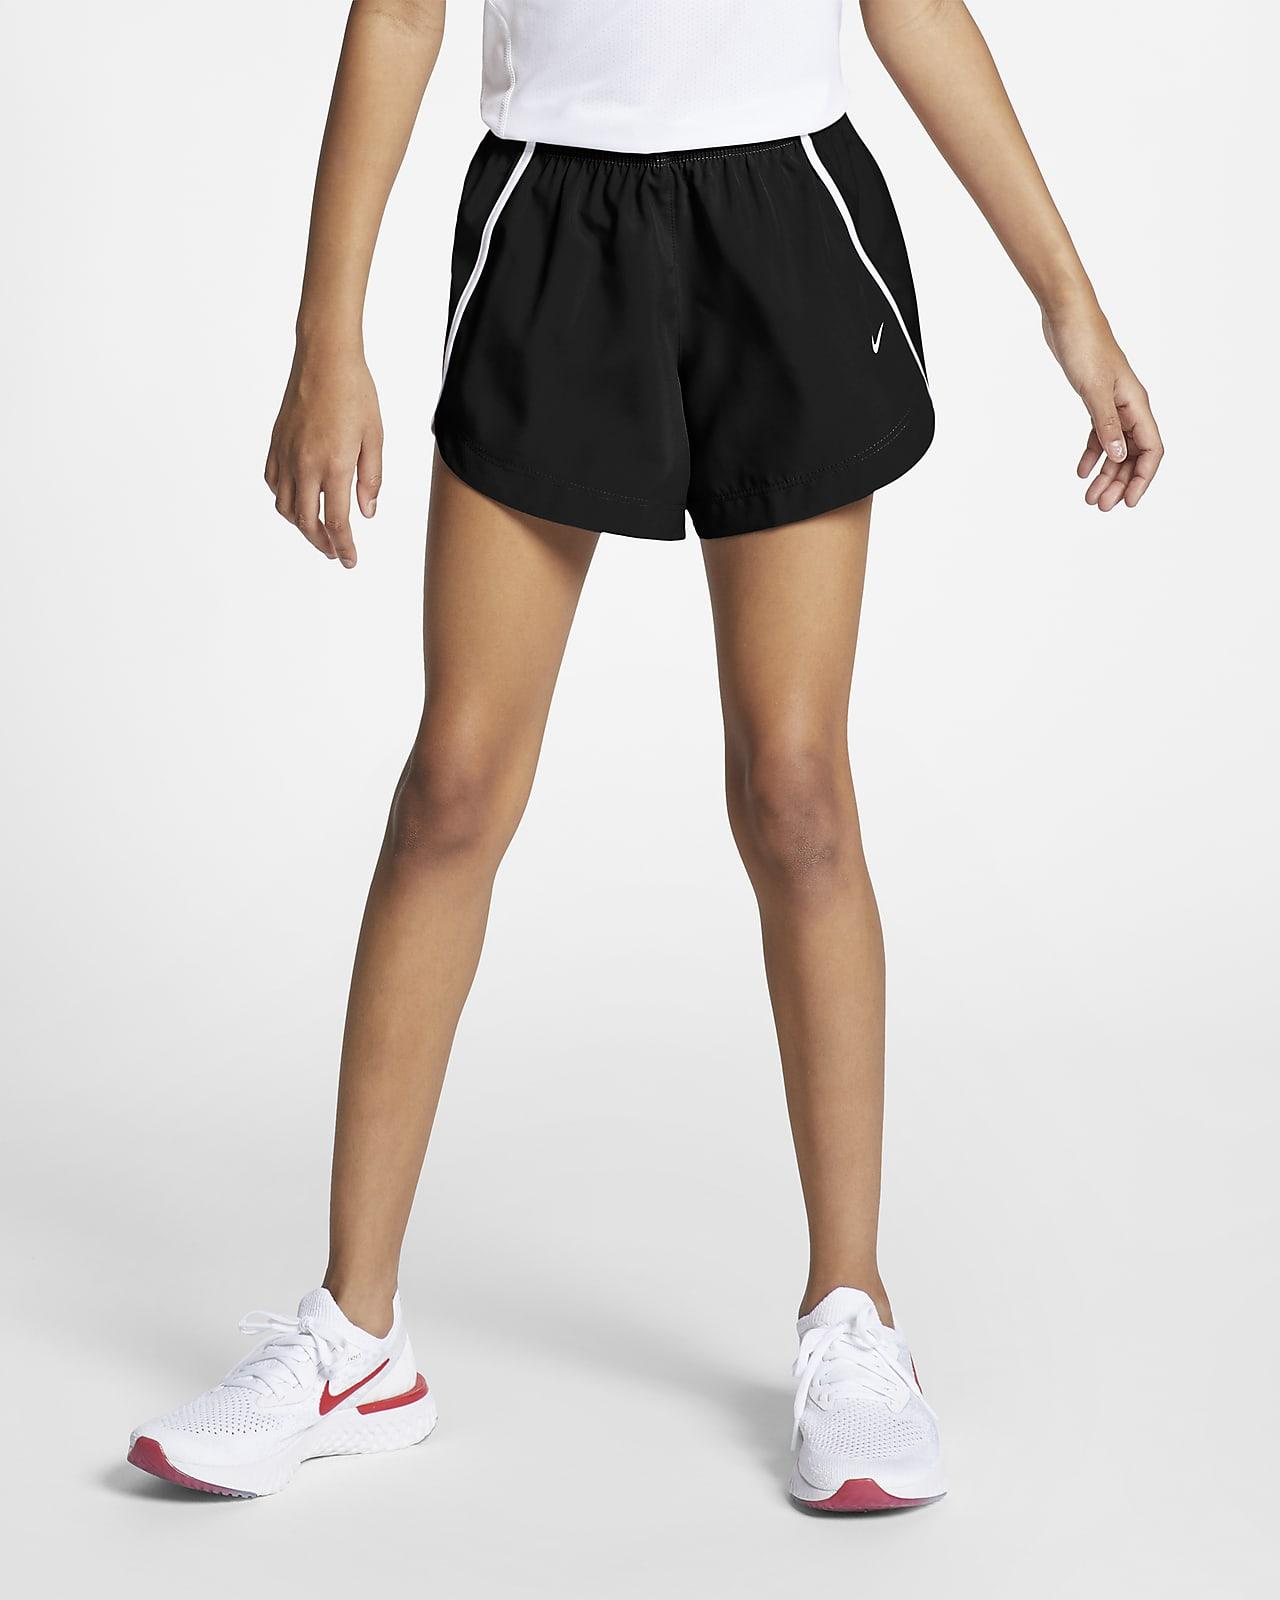 Nike Dry Older Kids' (Girls') Running Shorts. Nike NL